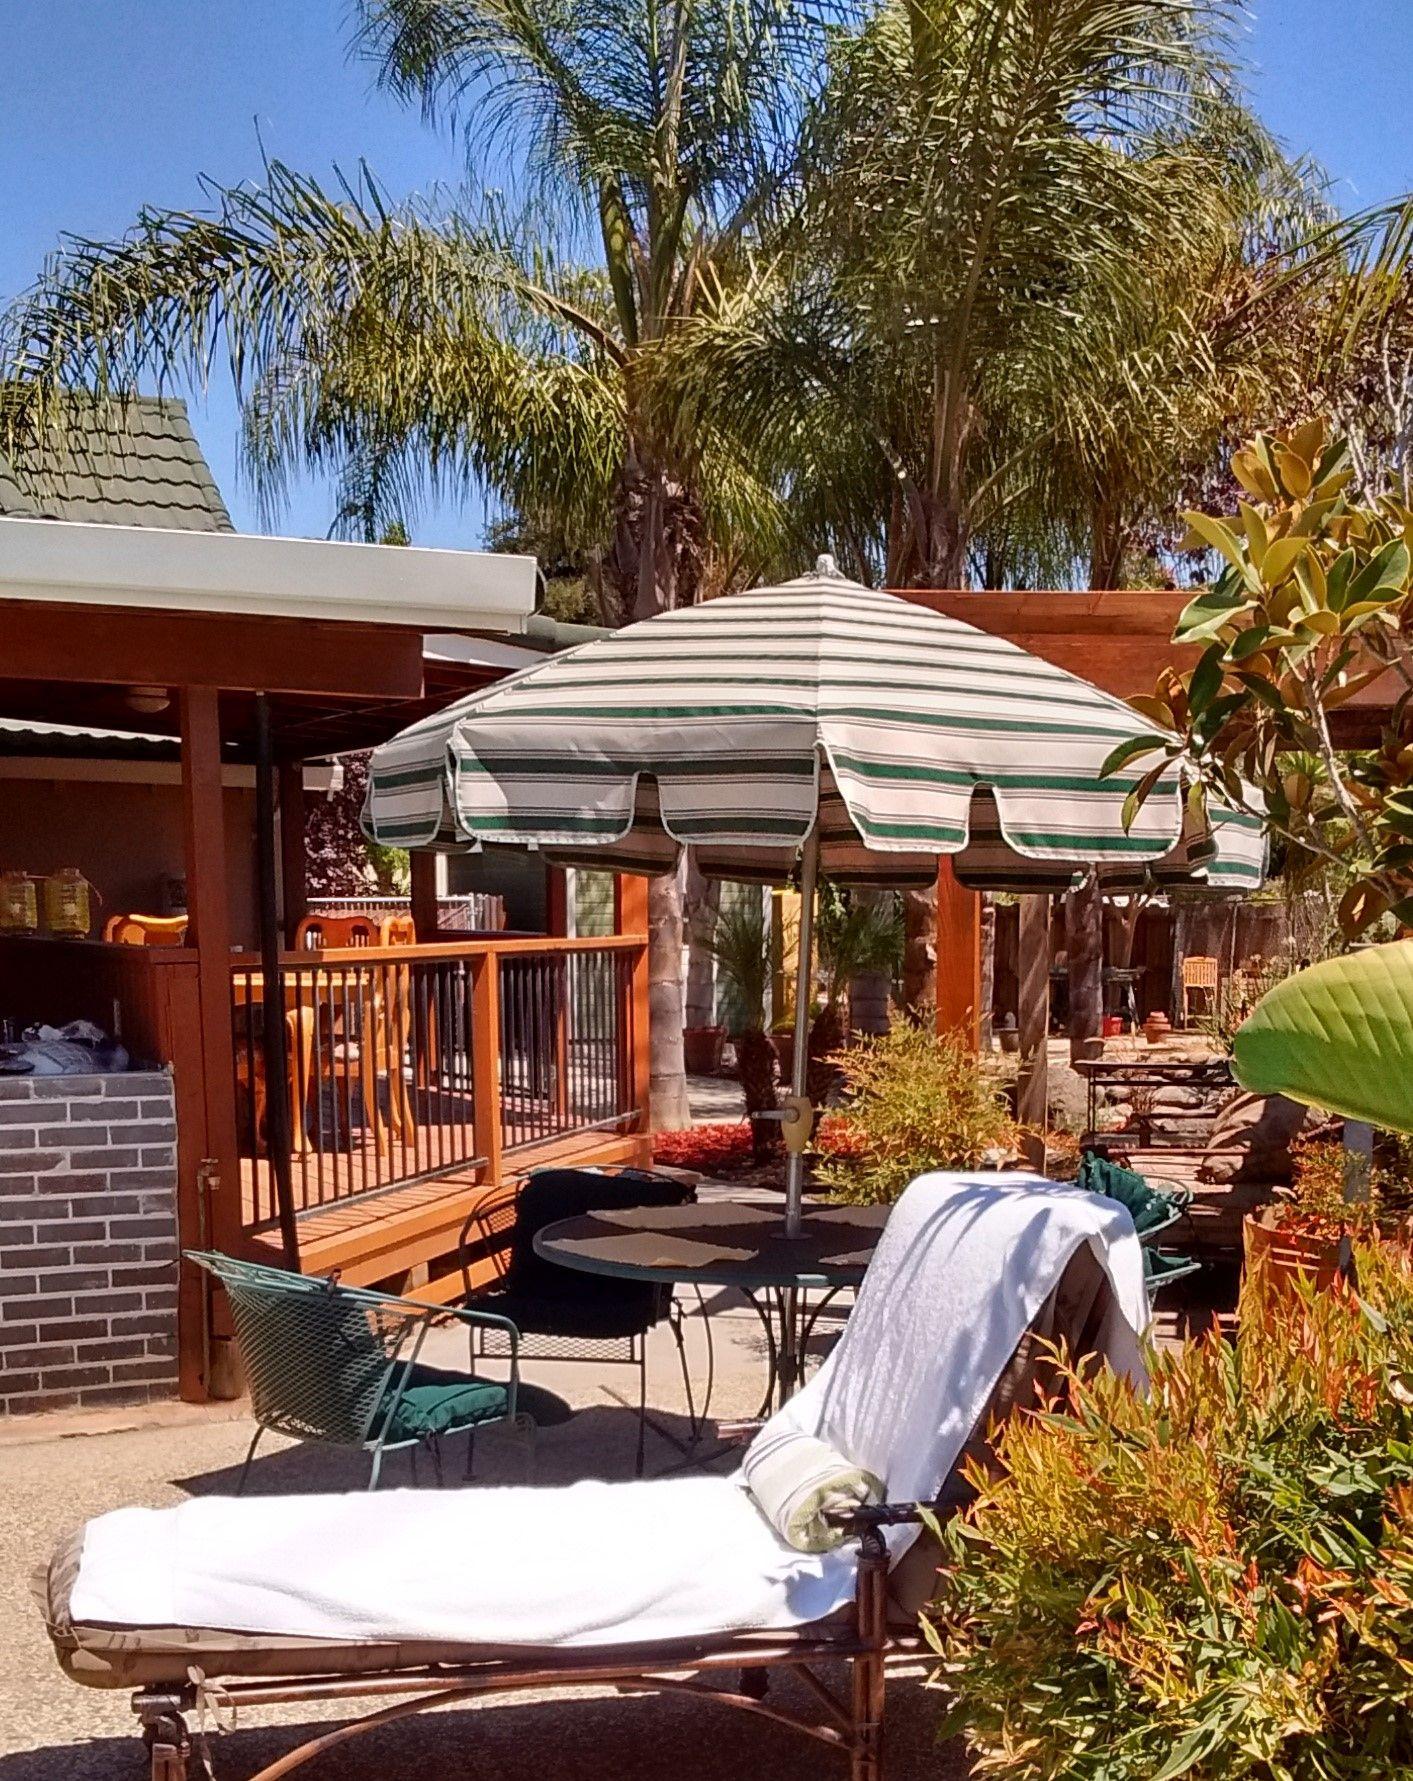 Pin by California Real Estate on Backyard Fun Santa Clara ...